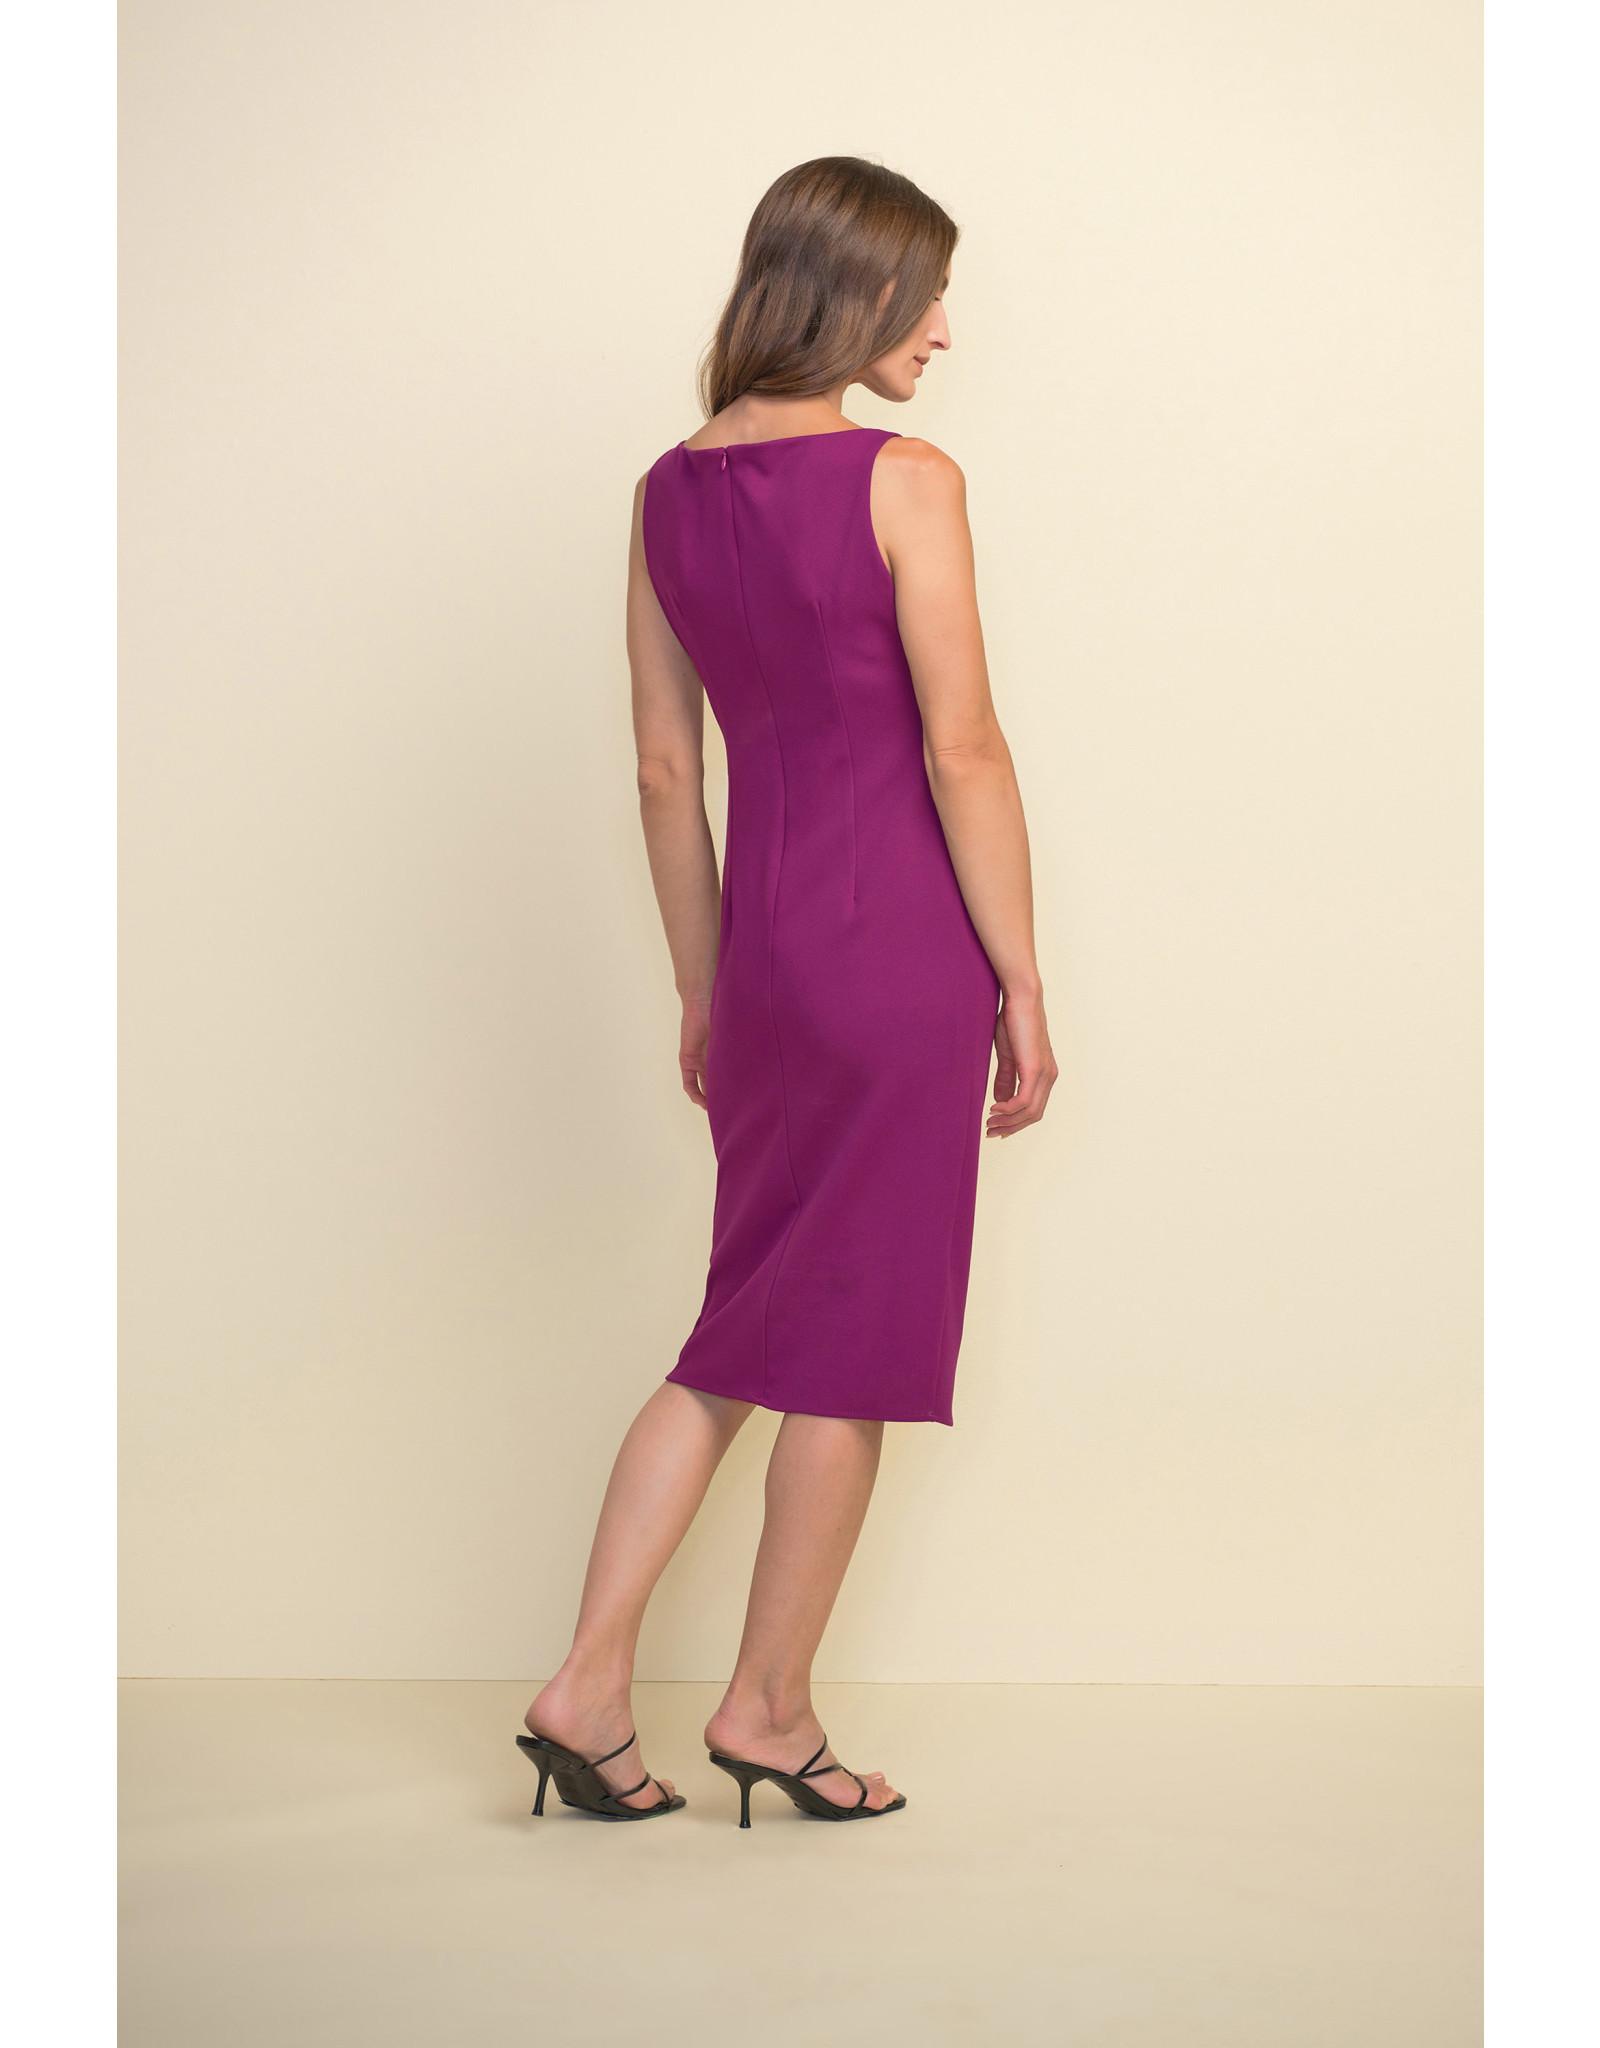 Joseph Ribkoff Sleeveless Dress With Bow Detail